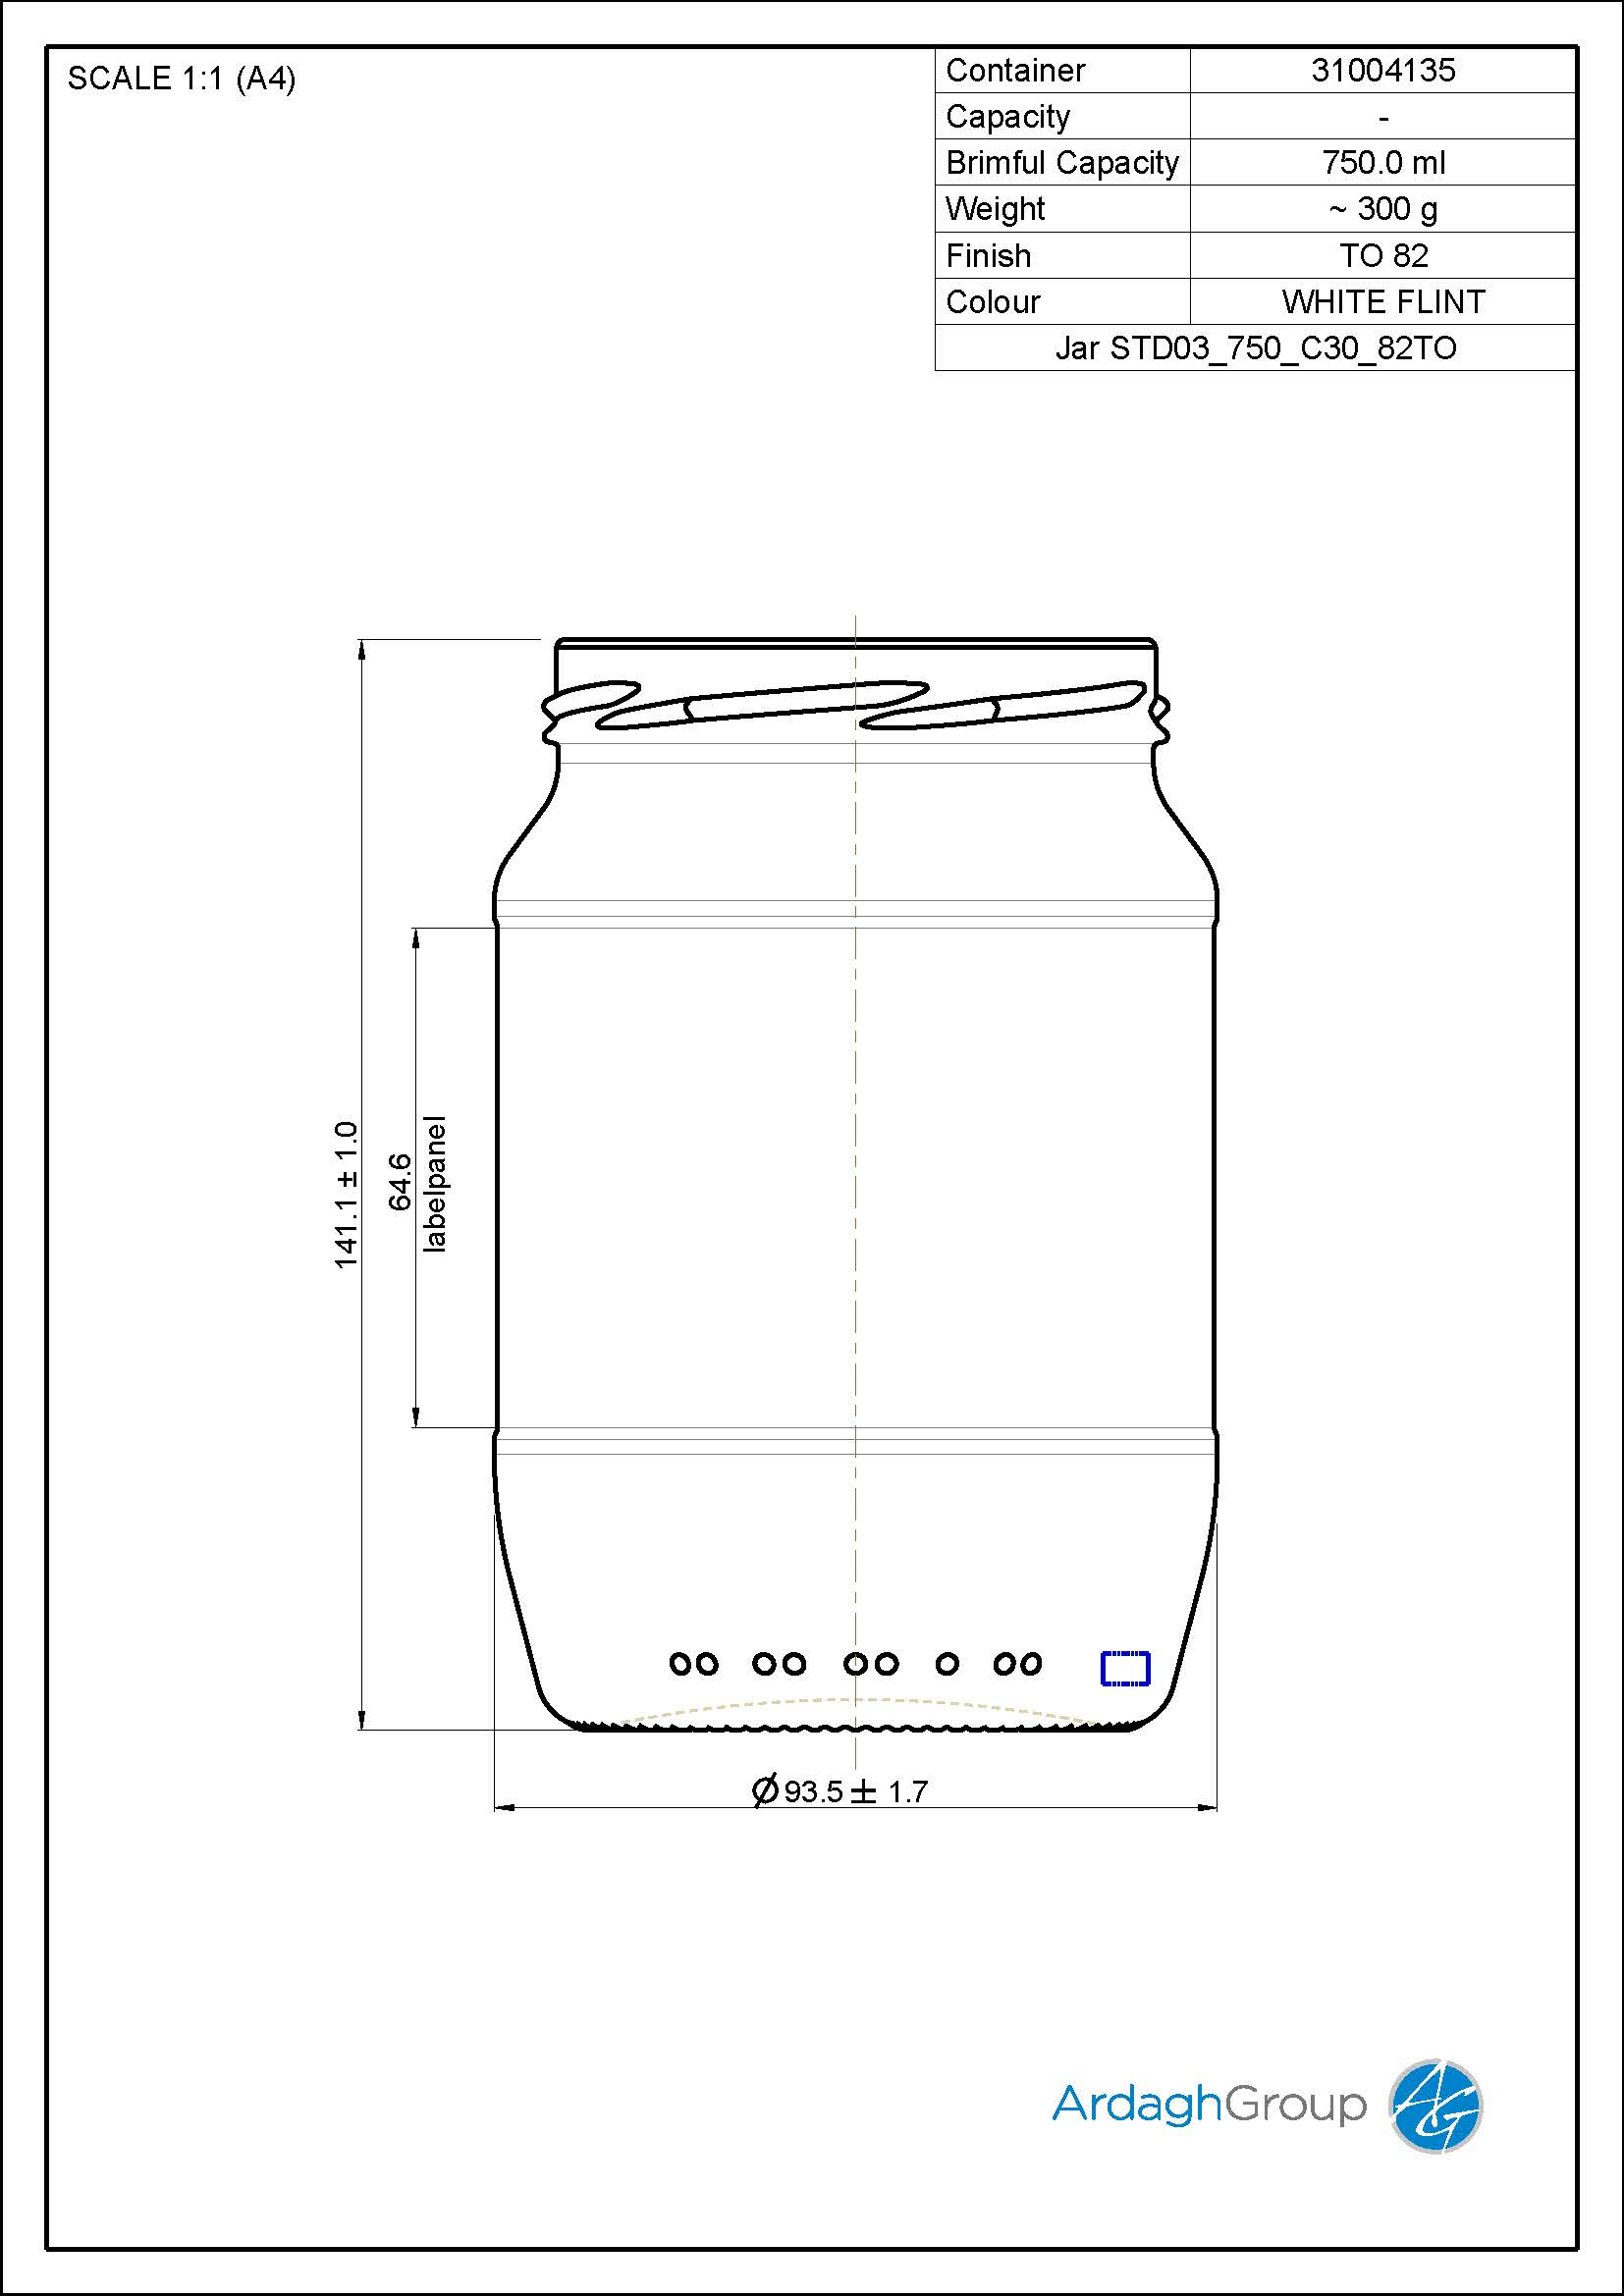 Jar STD03 750 C30 82TO